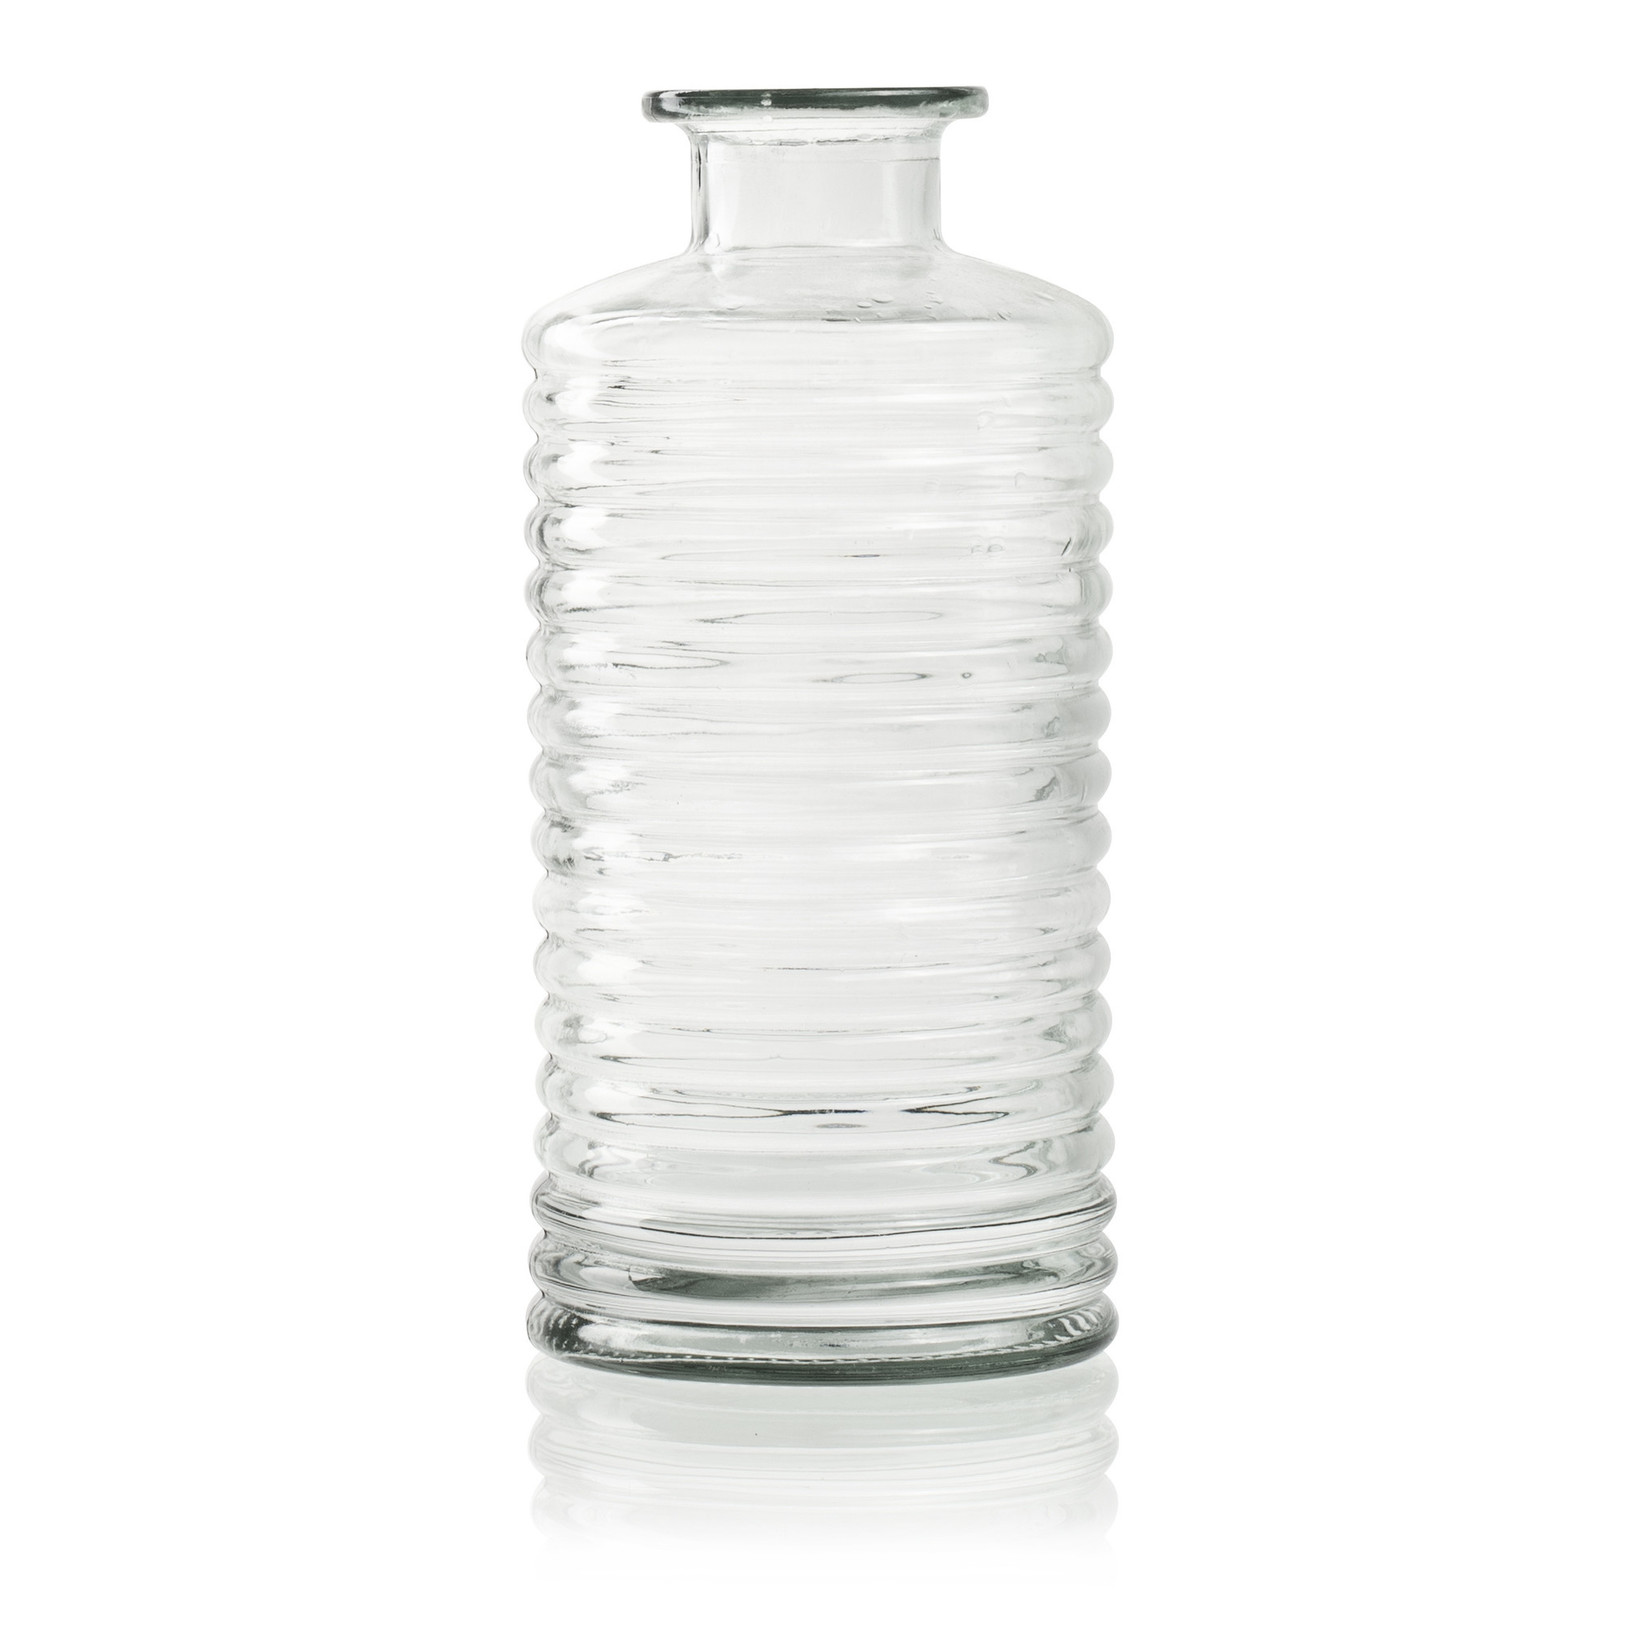 Jodeco Glass Flesvaas met ribbel 'Fokke' H31 D14,5 cm Transparant